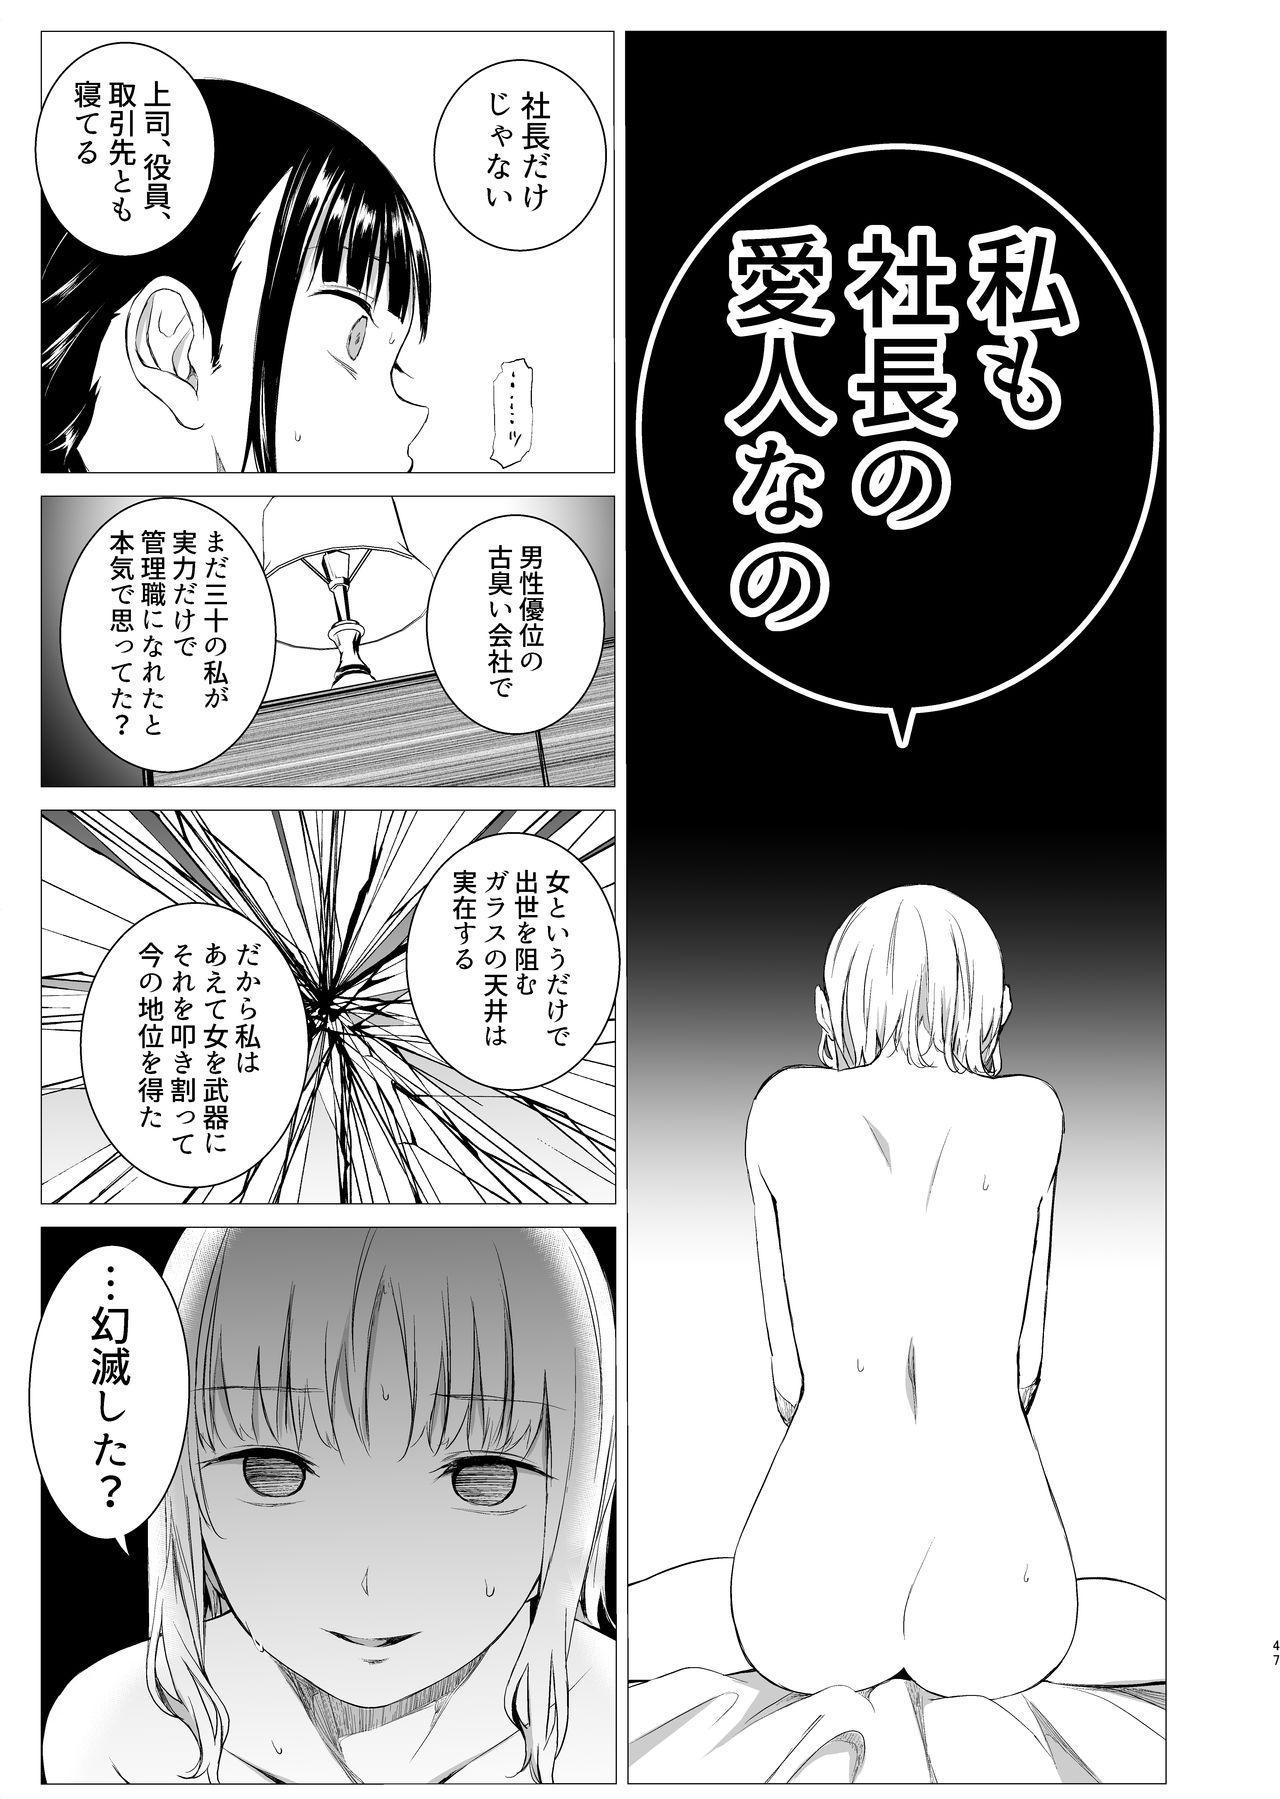 Hanayomi no Makurakotoba 45